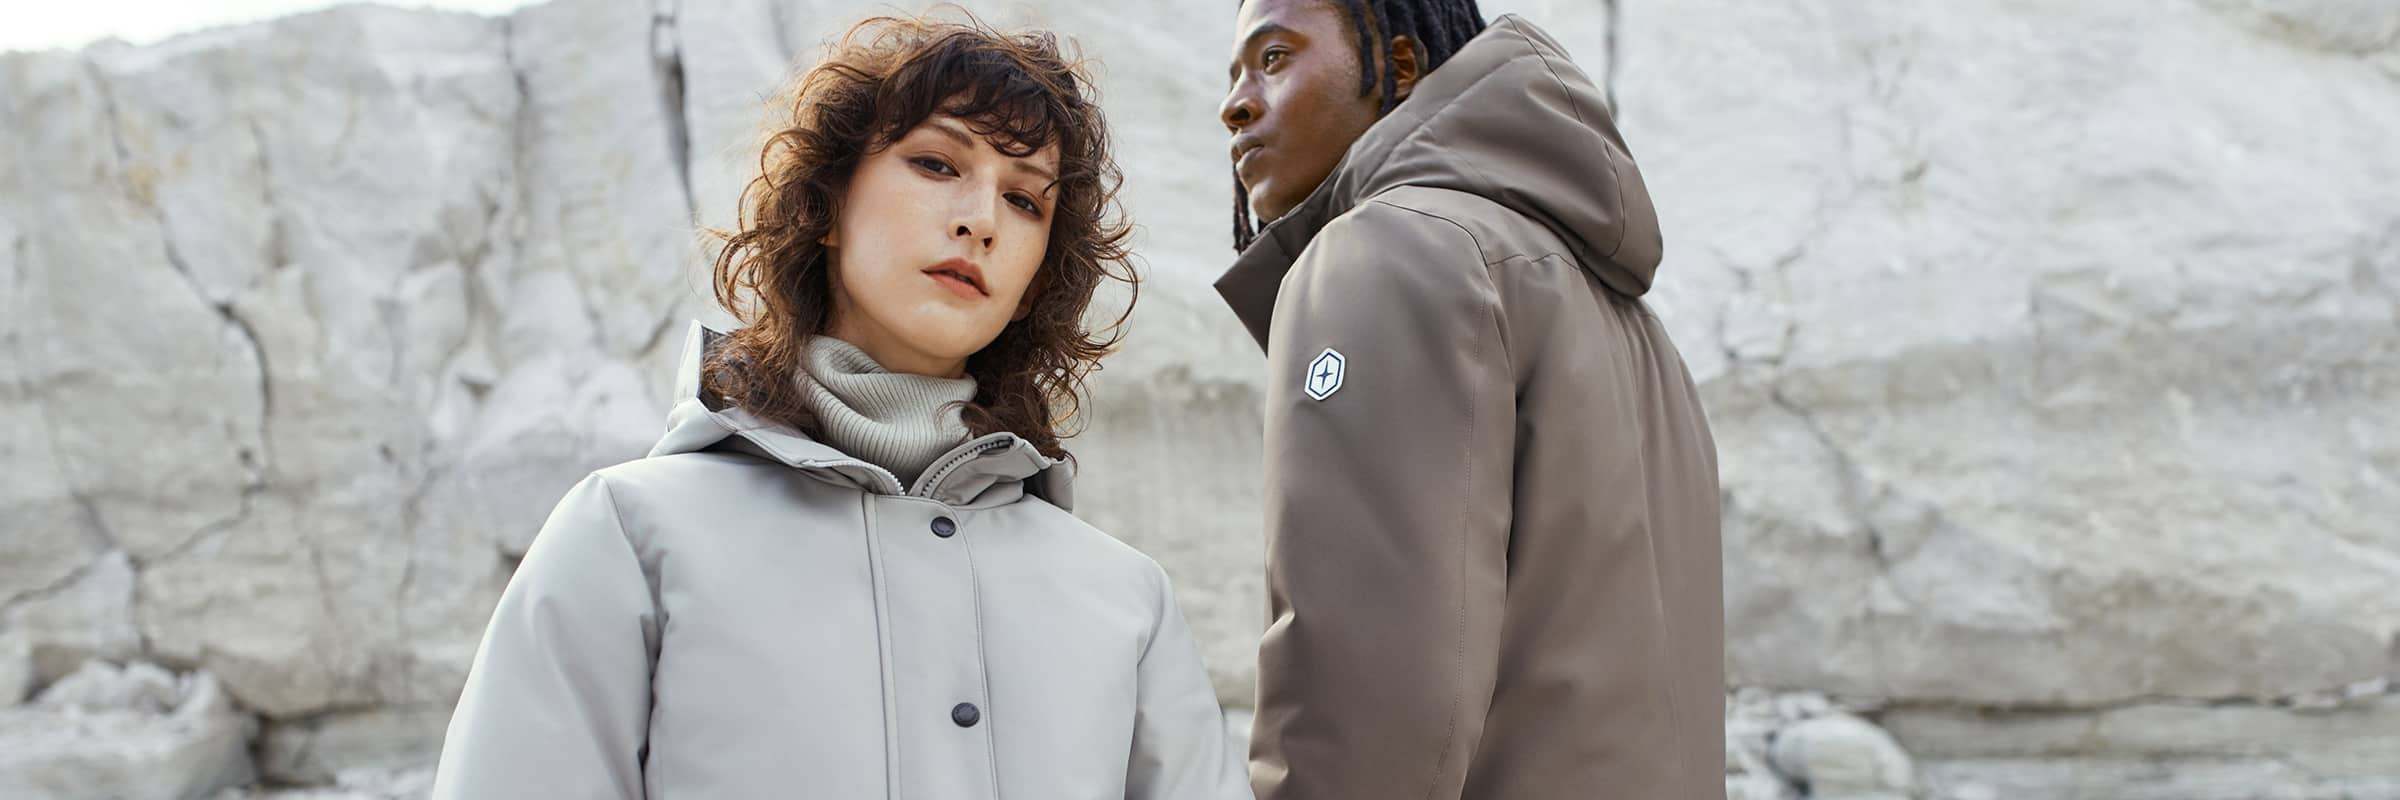 Canadian-Made & Designed Winter Coats